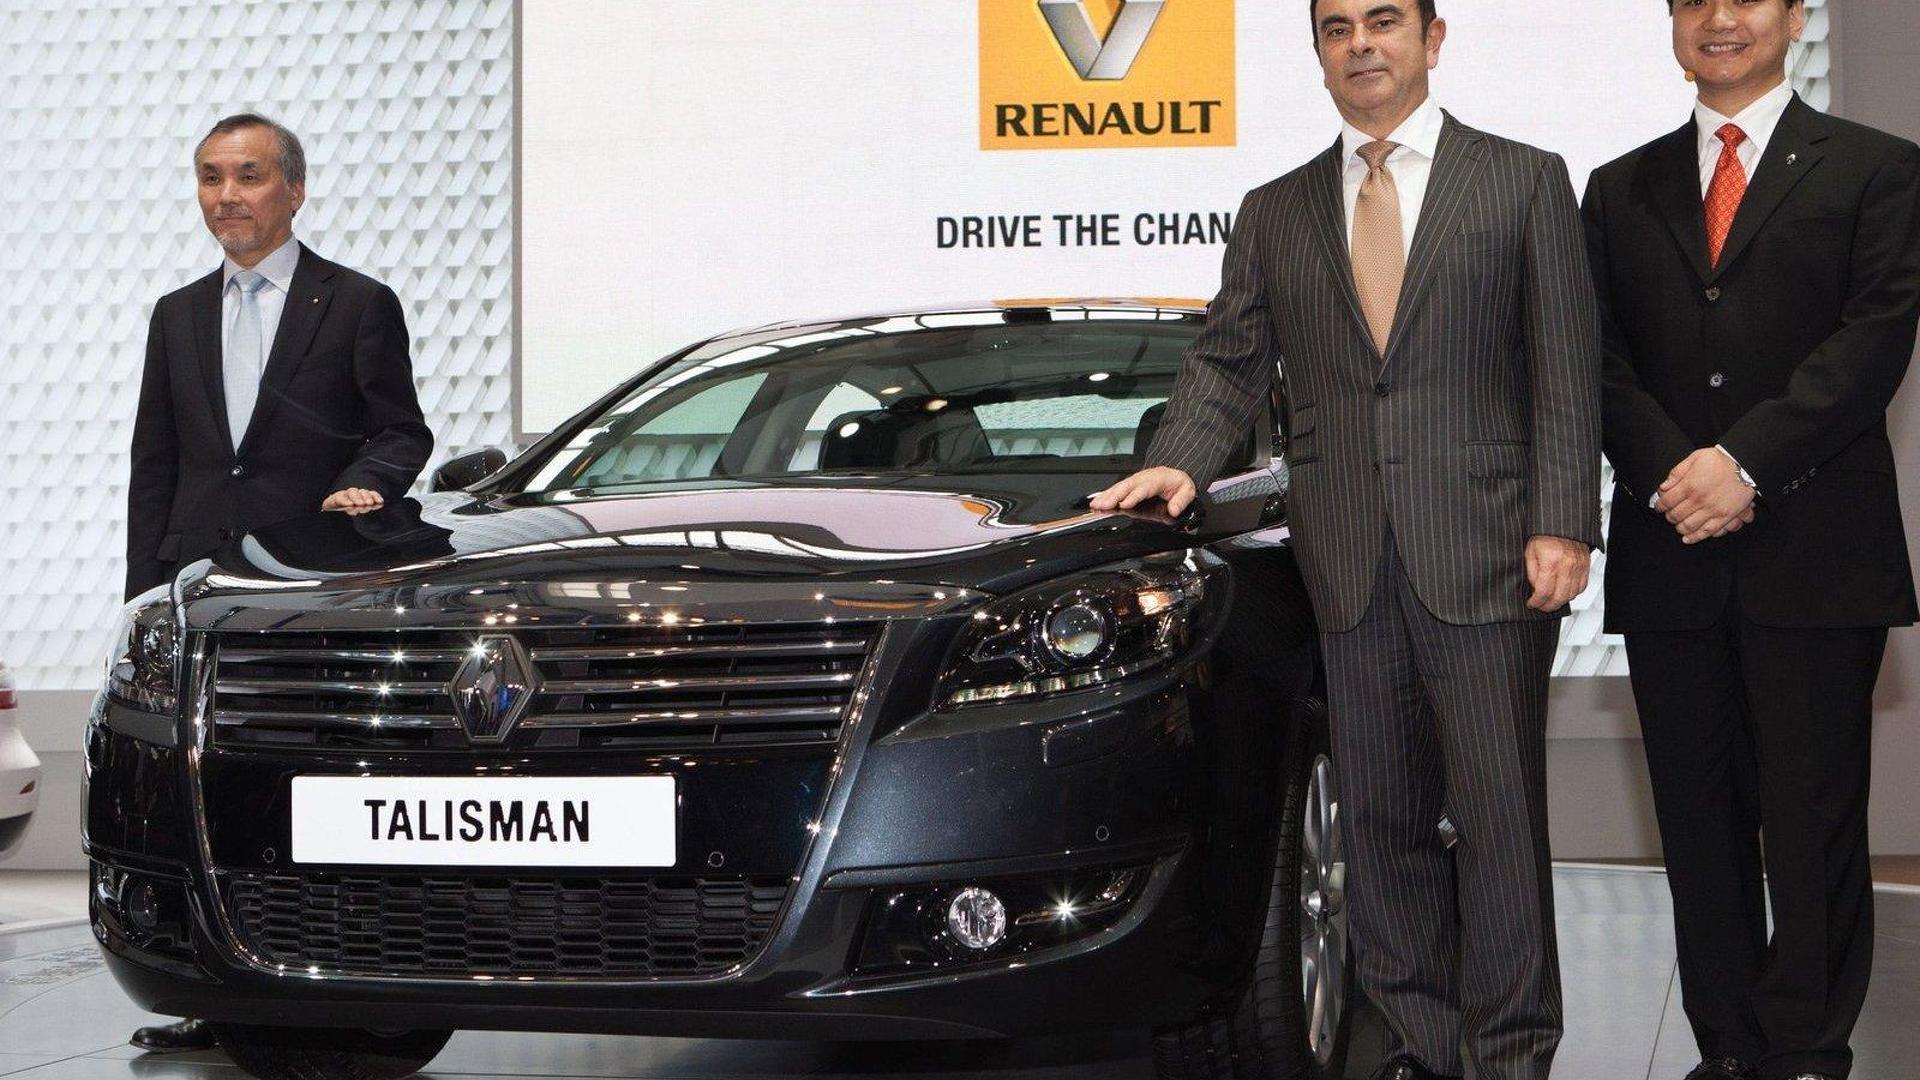 Renault Talisman luxury sedan unveiled at Beijing Motor Show